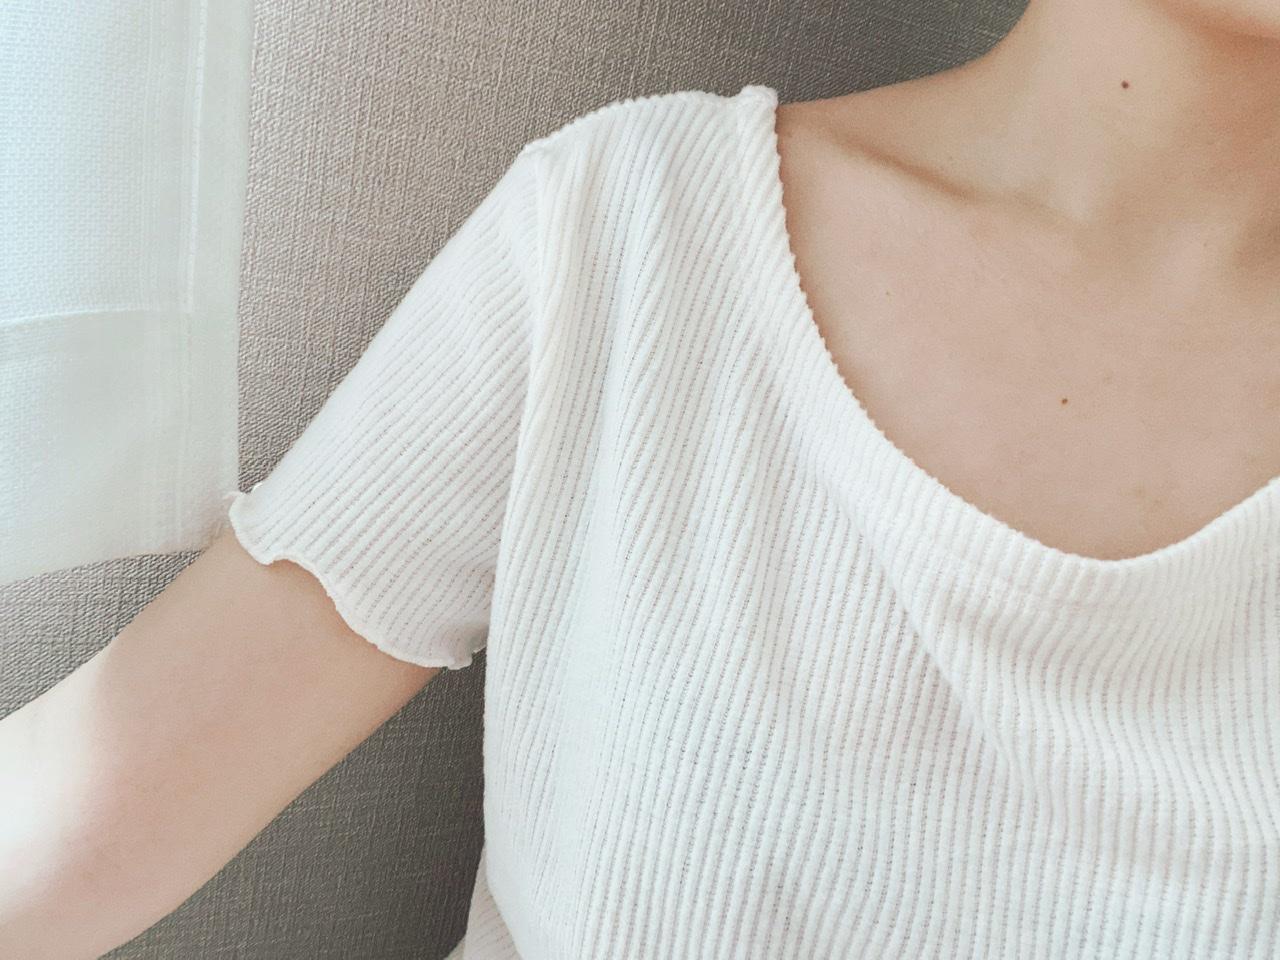 【GU】大絶賛の嵐!新作パジャマが史上最高の可愛さ♡《ラウンジセット¥1,490》は絶対買い!_4